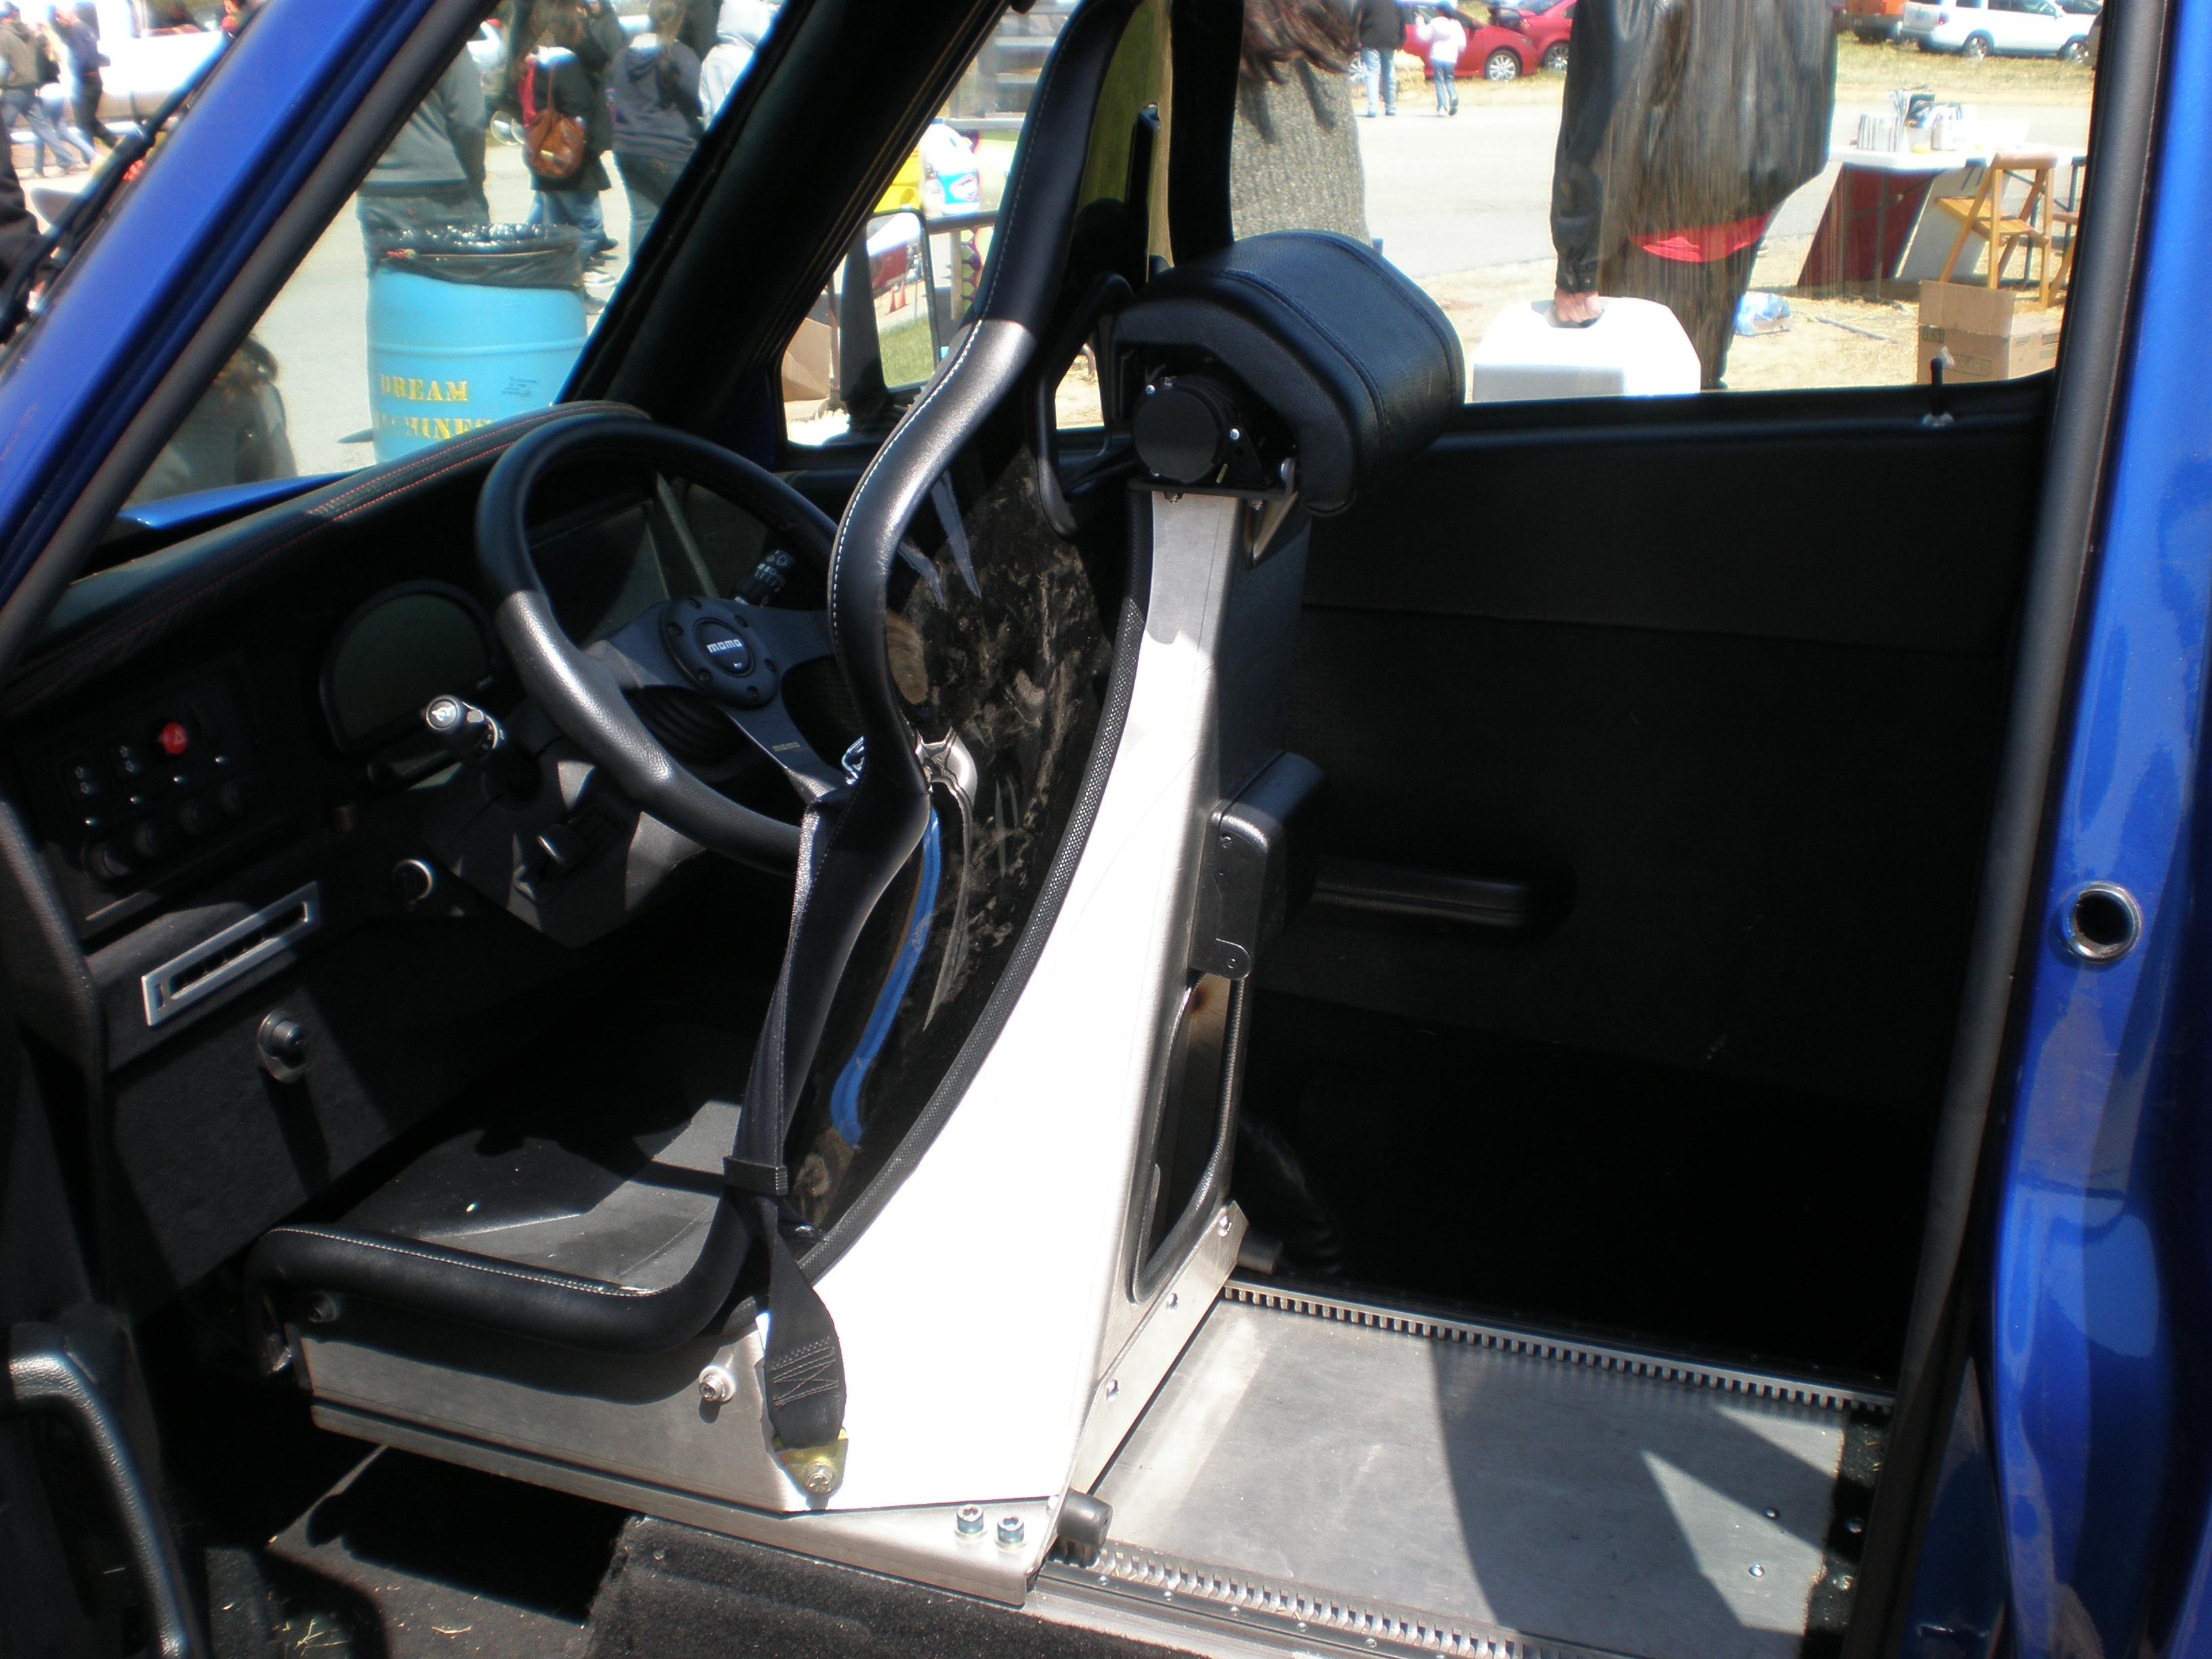 File:Blue Commuter Cars Tango T600 interior.JPG - Wikimedia Commons